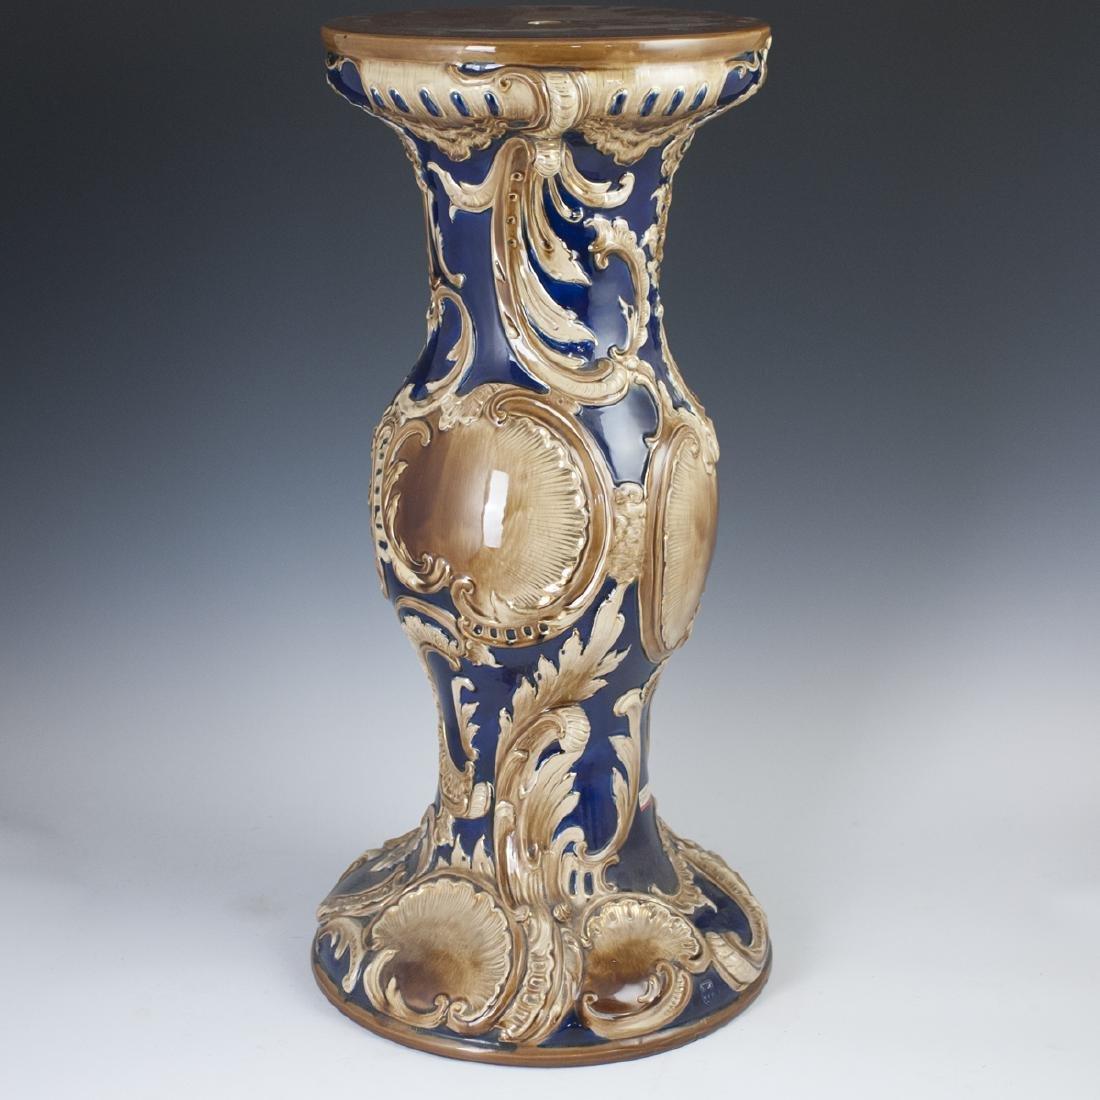 Decorative Majolica Glazed Porcelain Pedestal